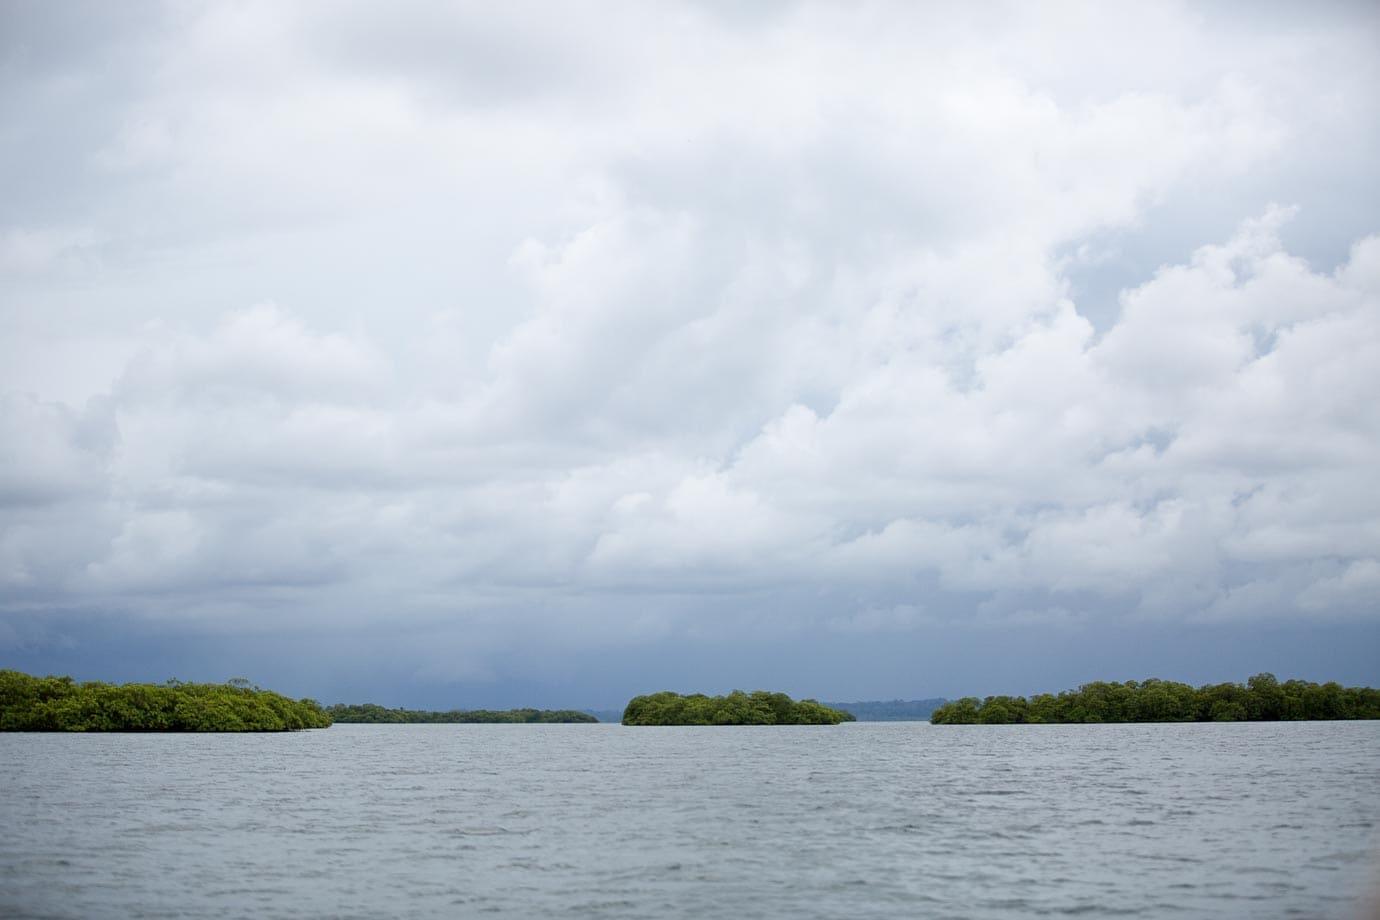 Islands of Bocas del Toro